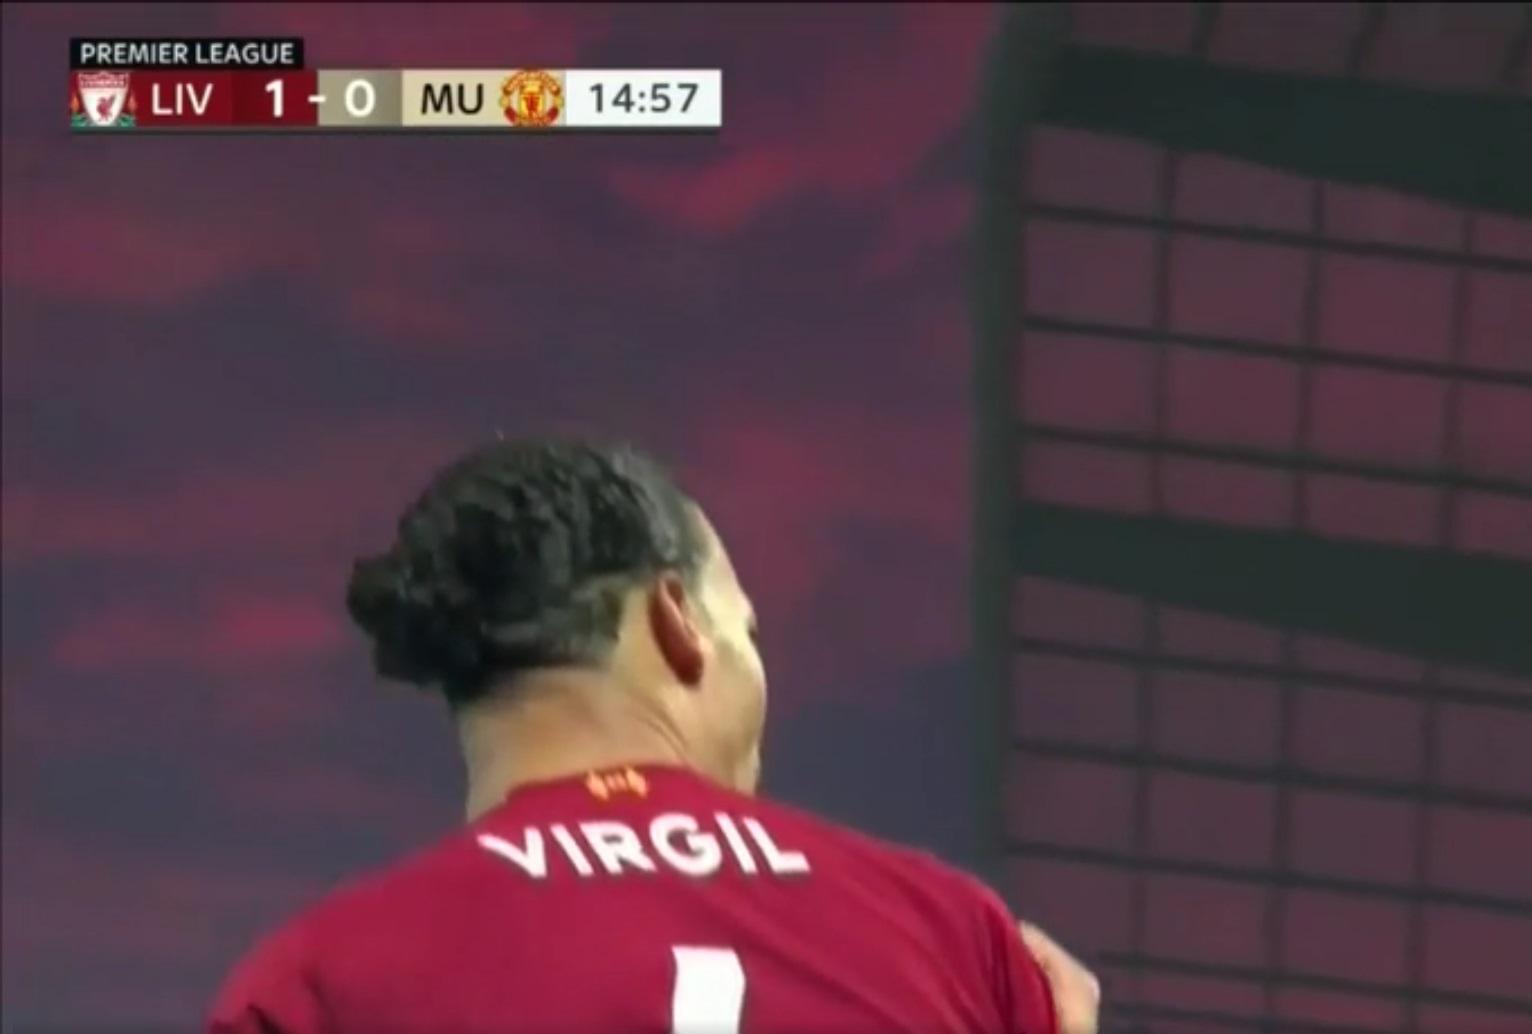 Scenes Of Virgil Flying Across Magic Liverpool Sky Deserve Special Place In World S Best Art Galleries Tribuna Com